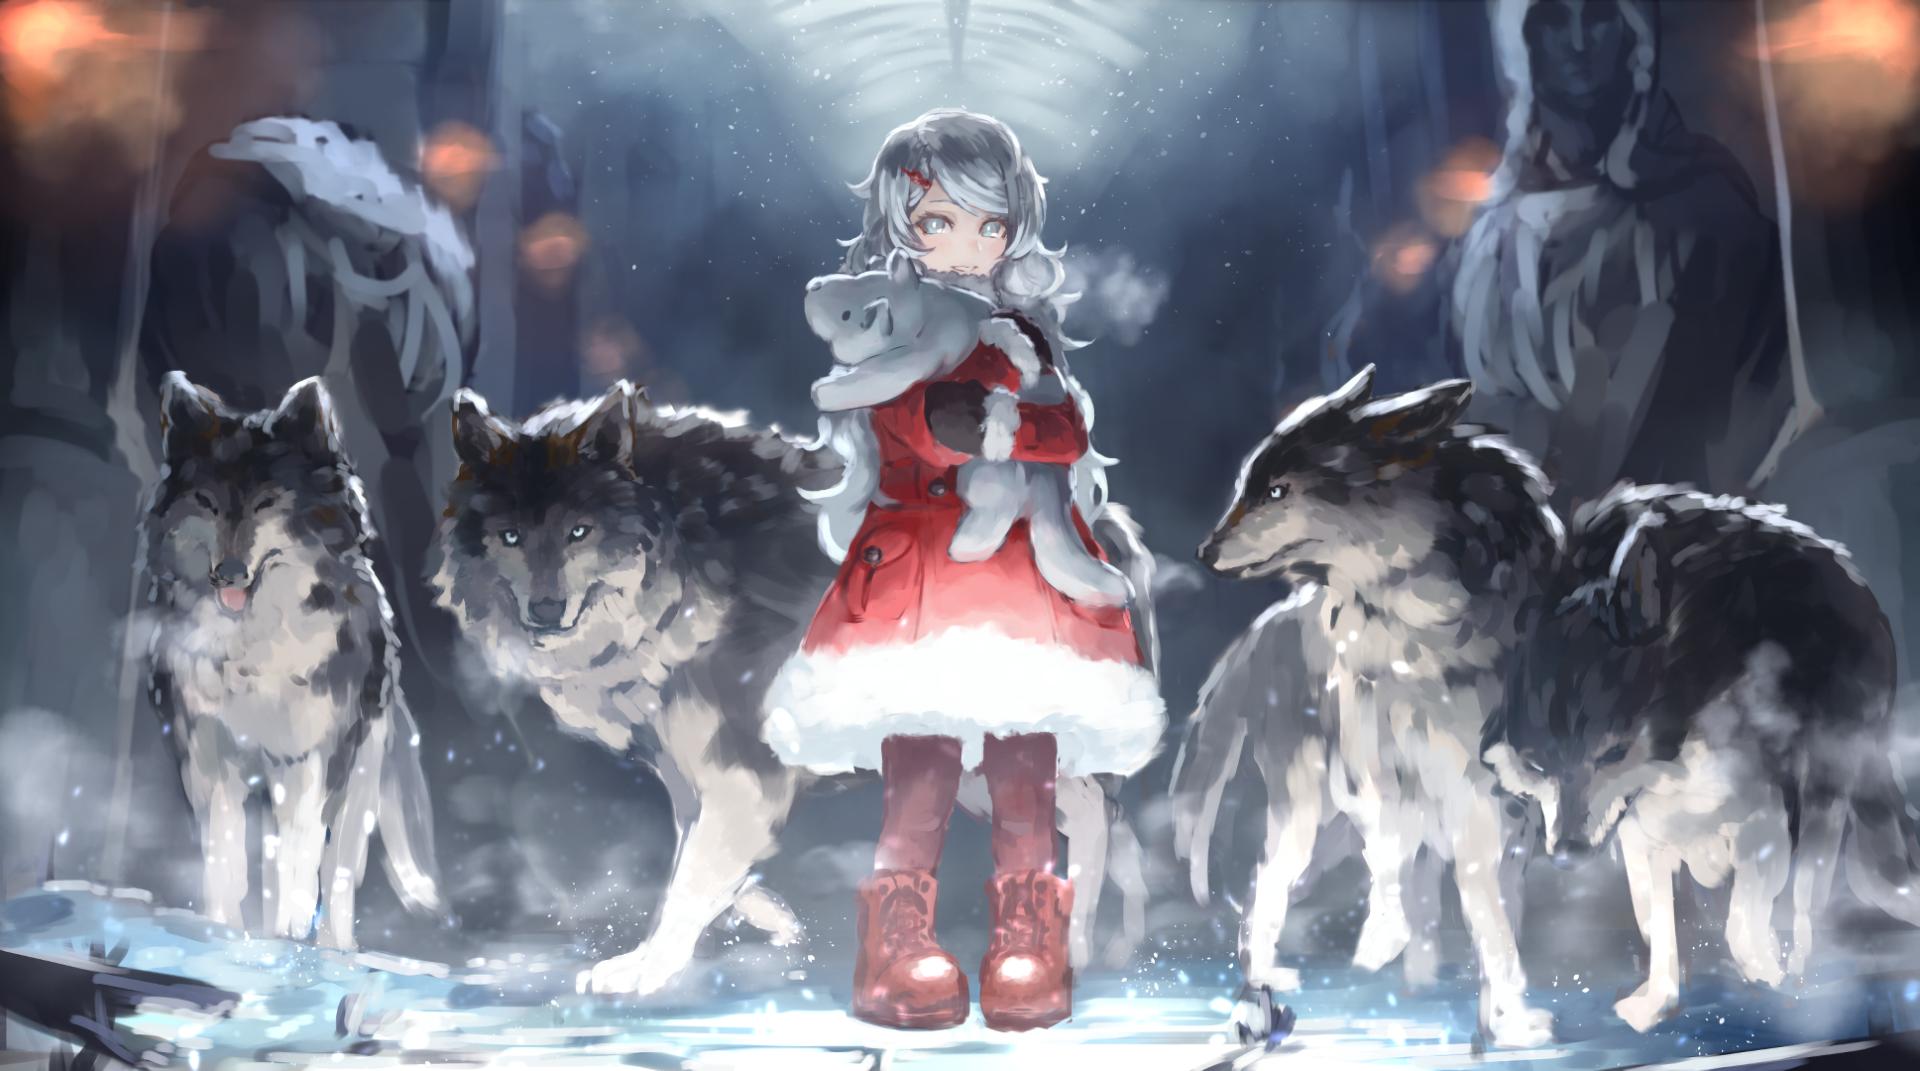 Anime - Original  Coat Stuffed Animal Grey Hair Aqua Eyes Snow Winter Animal Girl Wolf Wallpaper